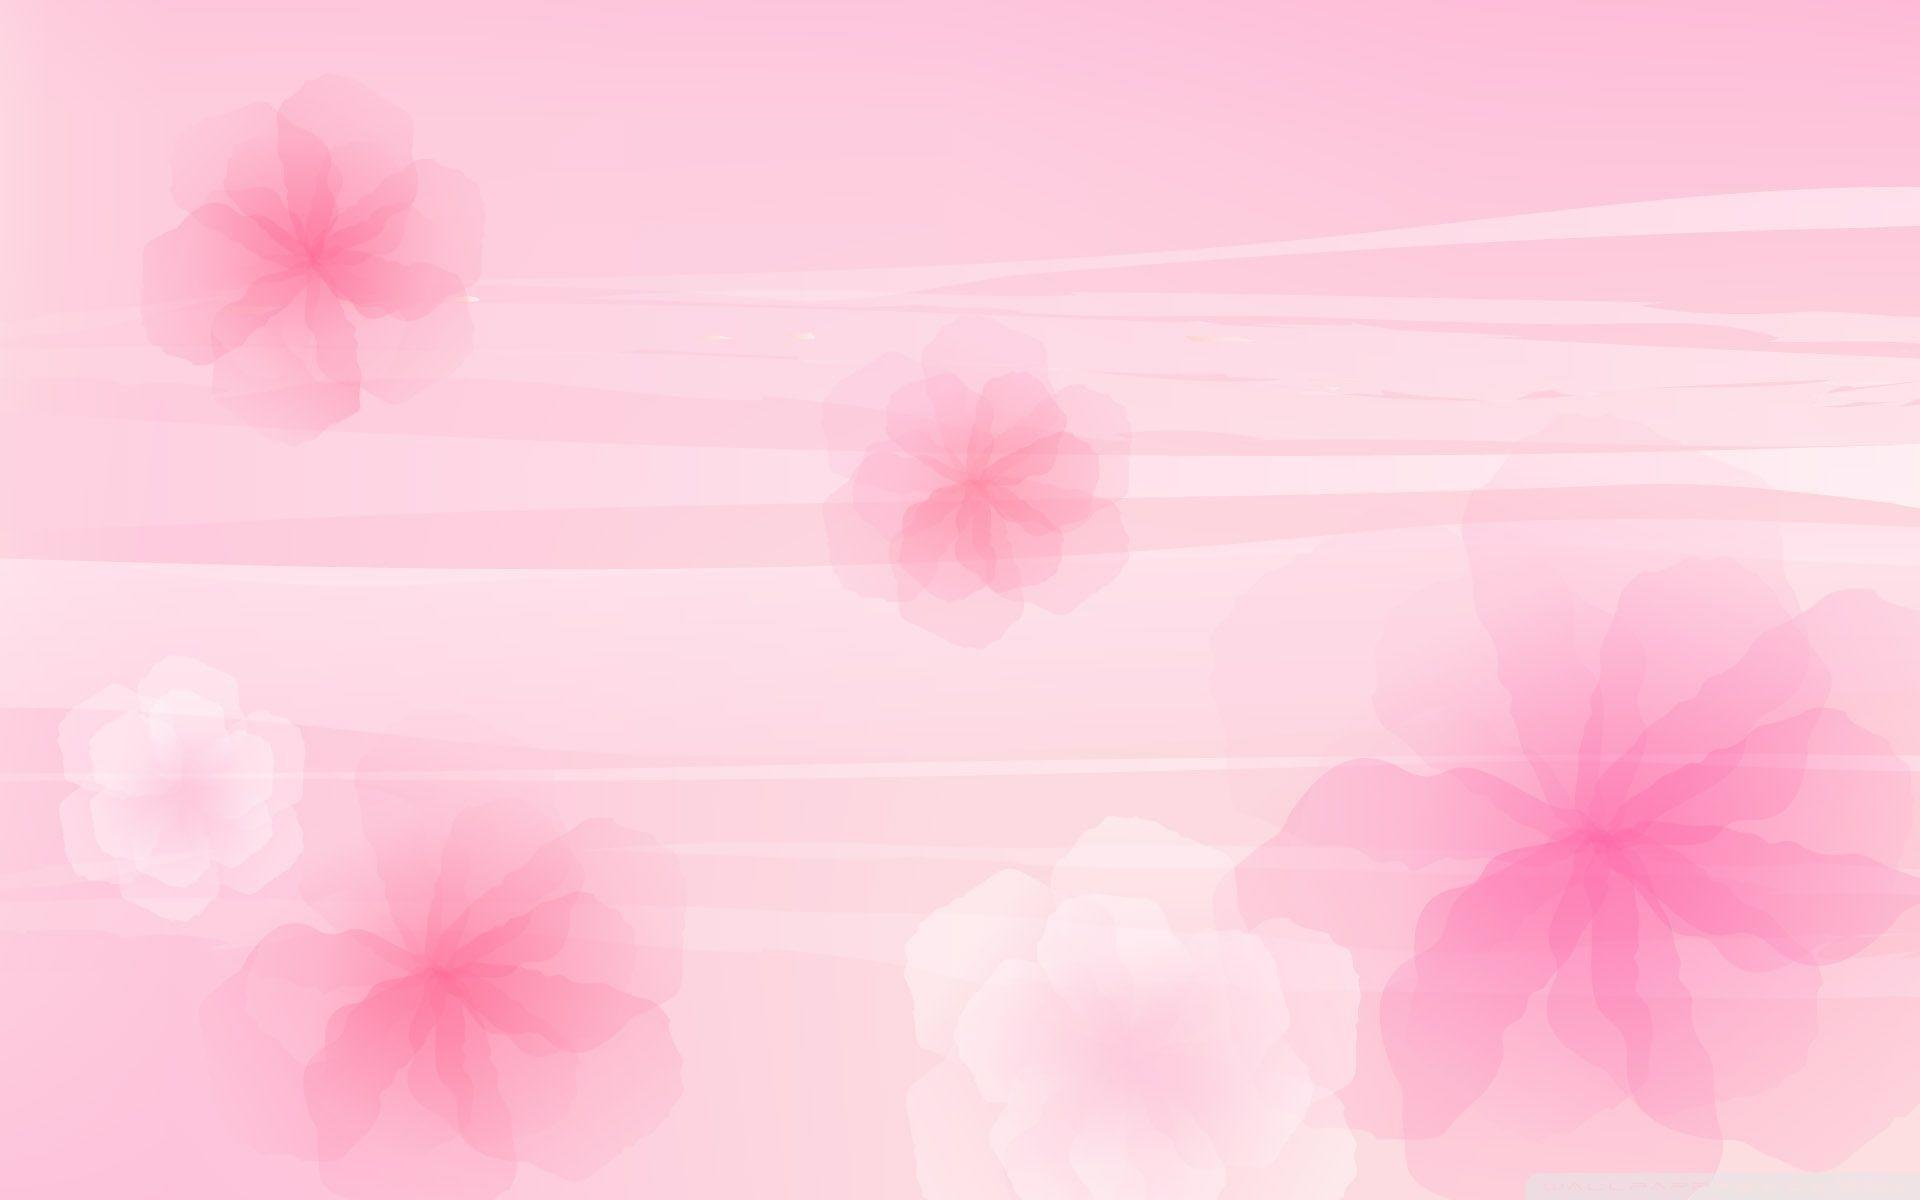 Light Pink Flower Wallpaper 58 Pictures